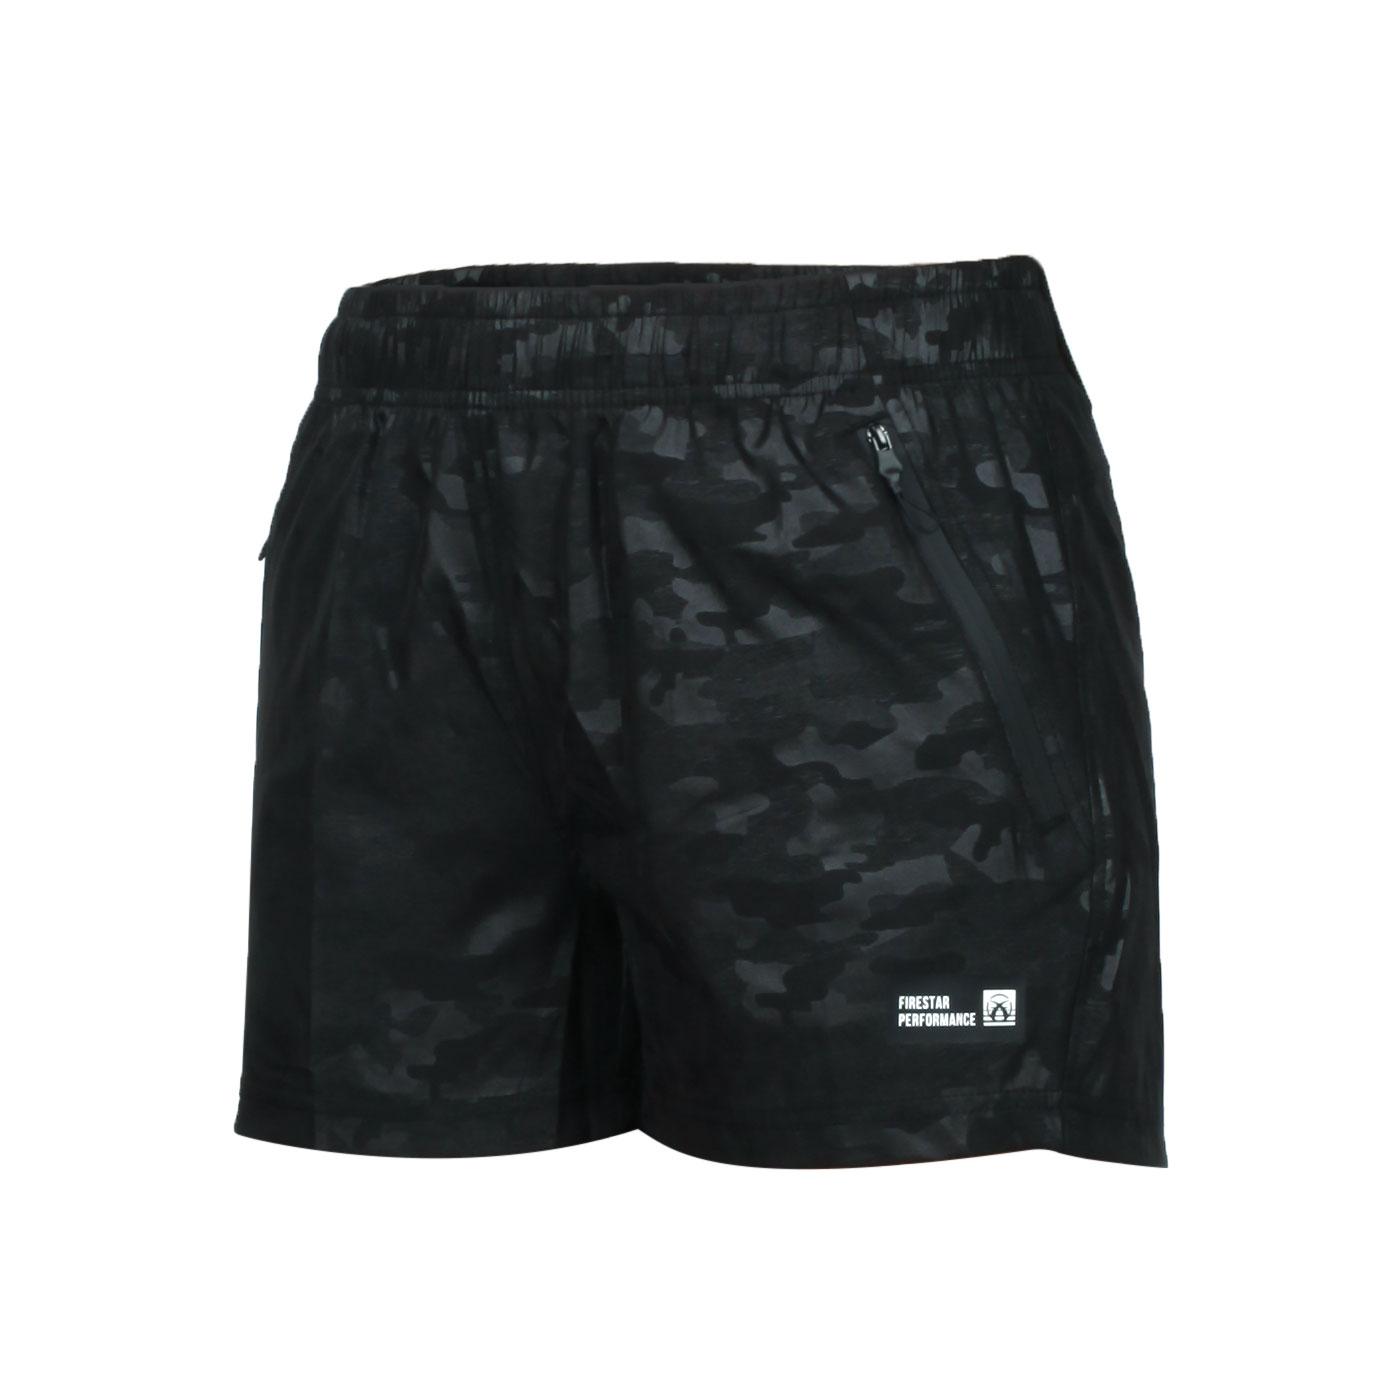 FIRESTAR 女款彈性平織短褲 CL022-10